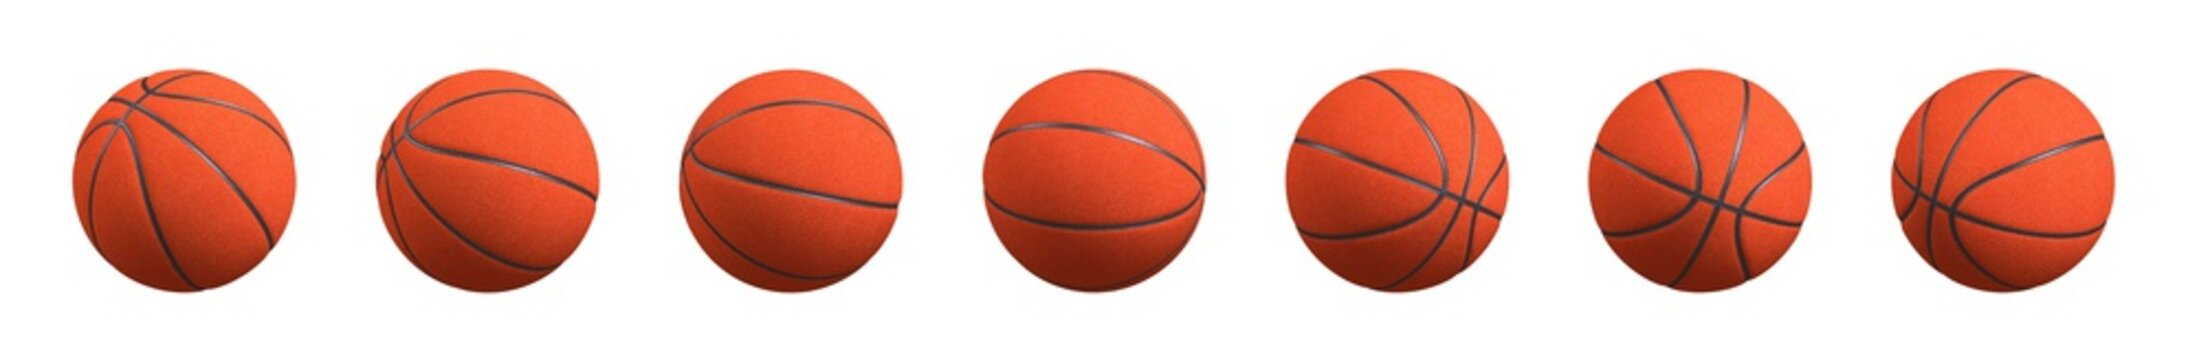 Basketball Ball Various Positions